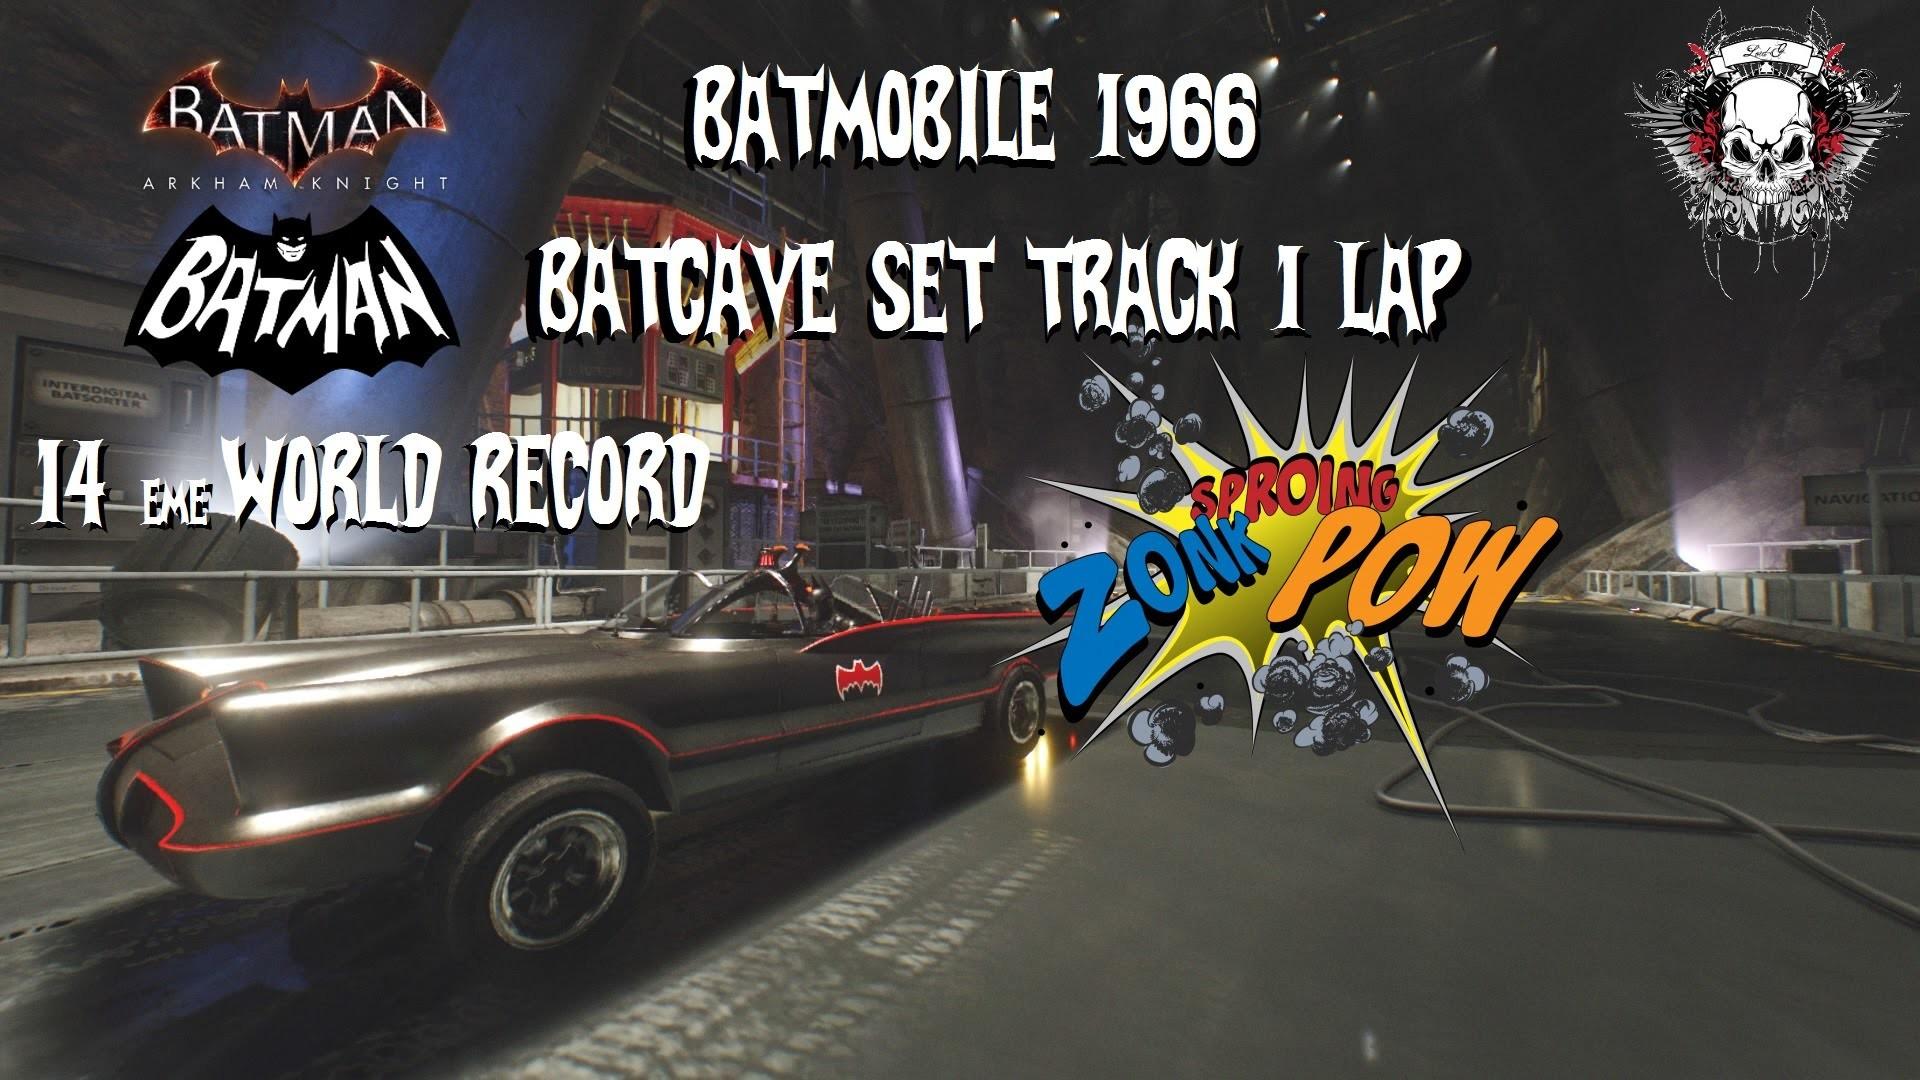 BATMAN™: ARKHAM KNIGHT Batmobile 1966 batcave set track 1lap